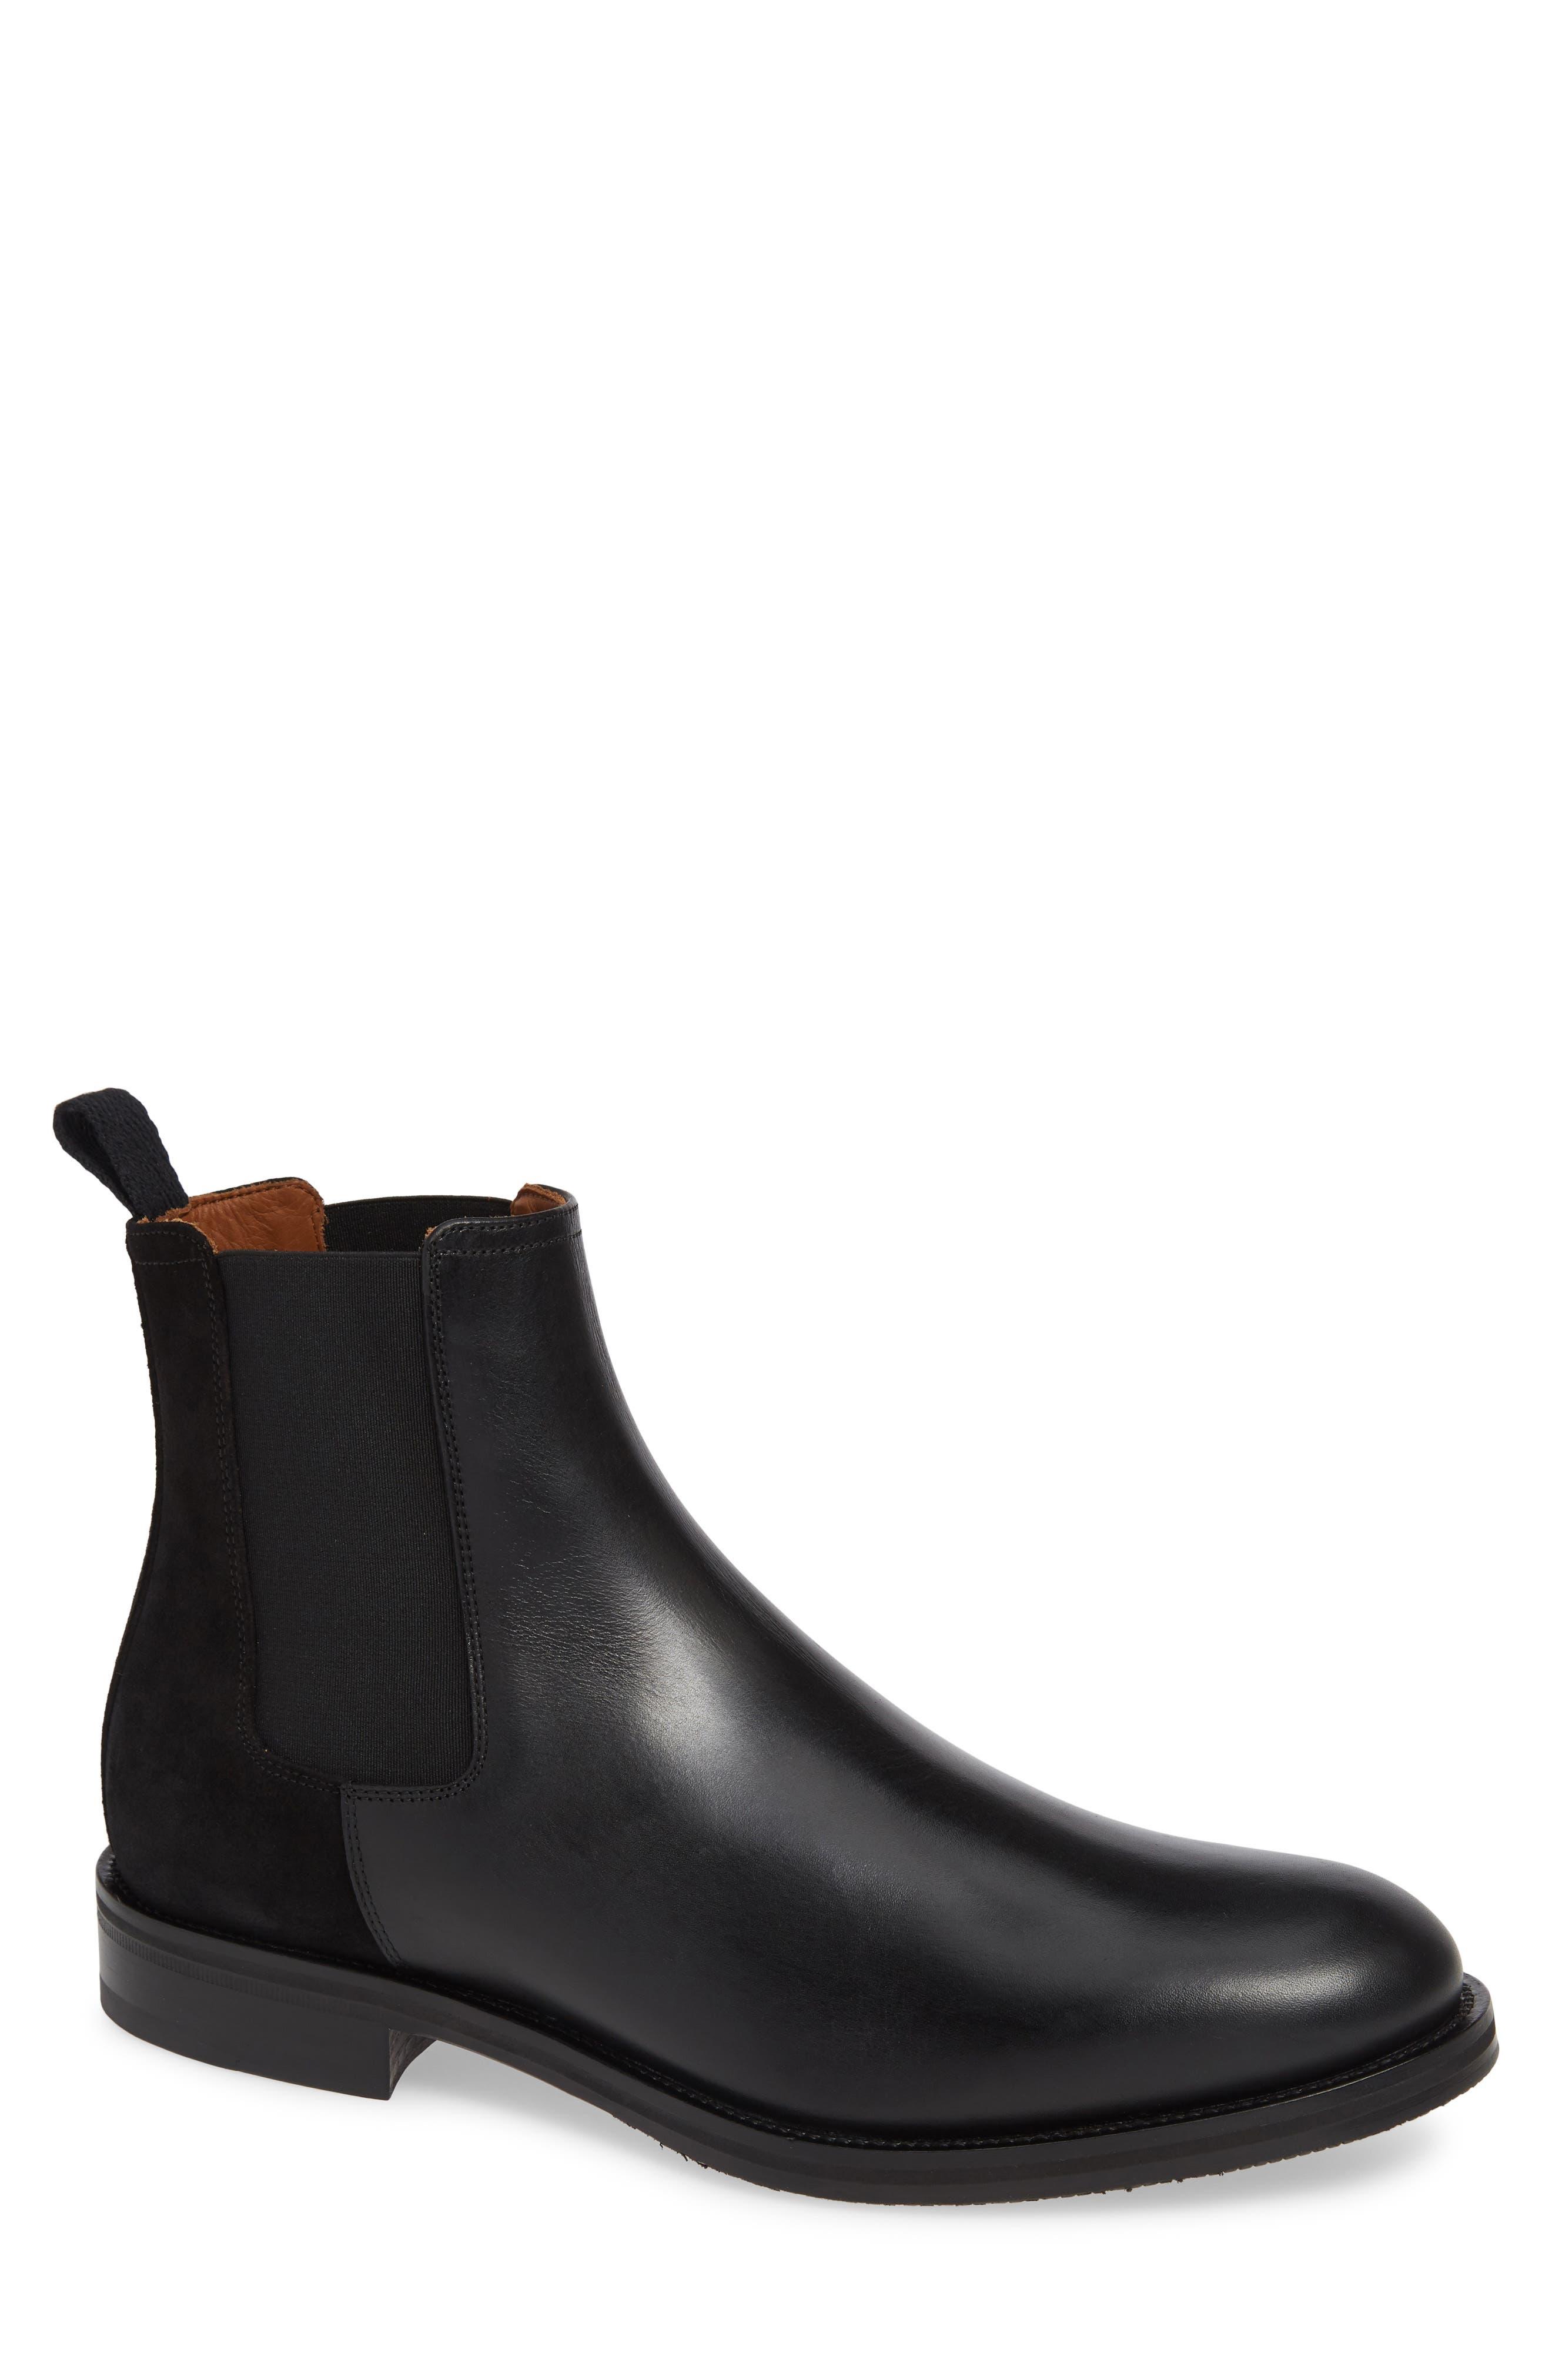 Aquatalia Giancarlo Weatherproof Chelsea Boot, Black